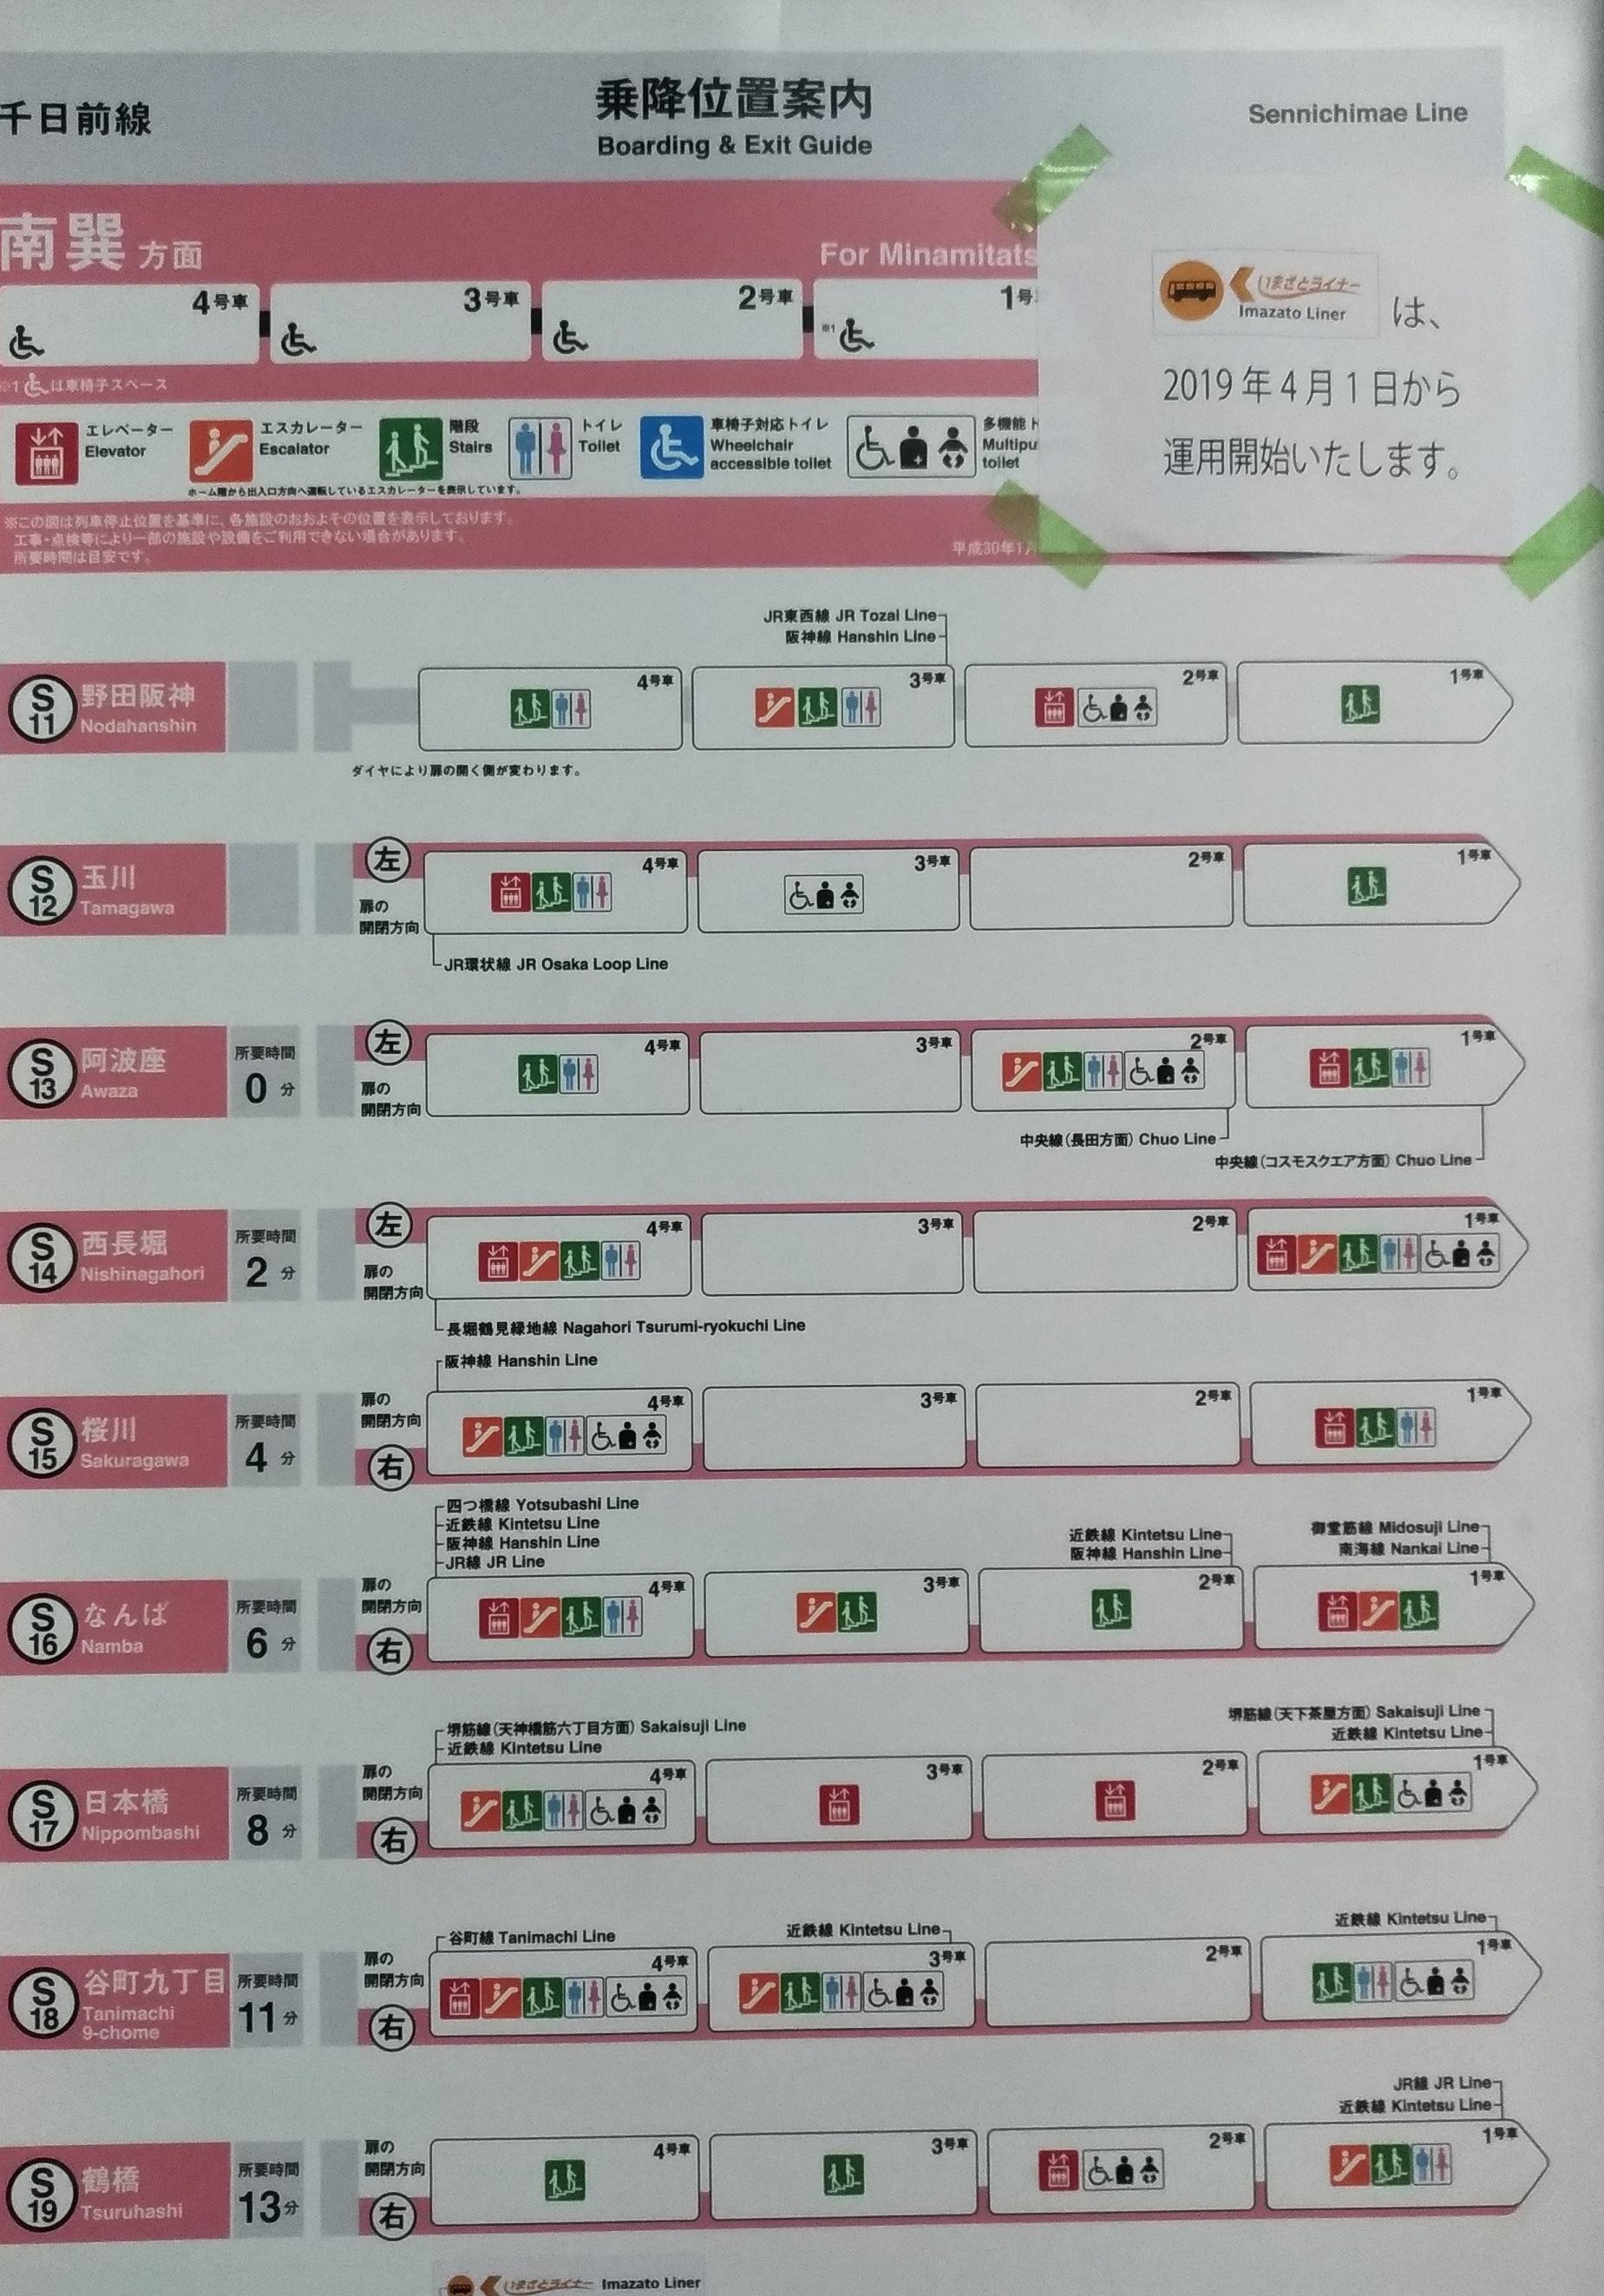 osaka_imazato_liner_osakametoro_bus.jpg